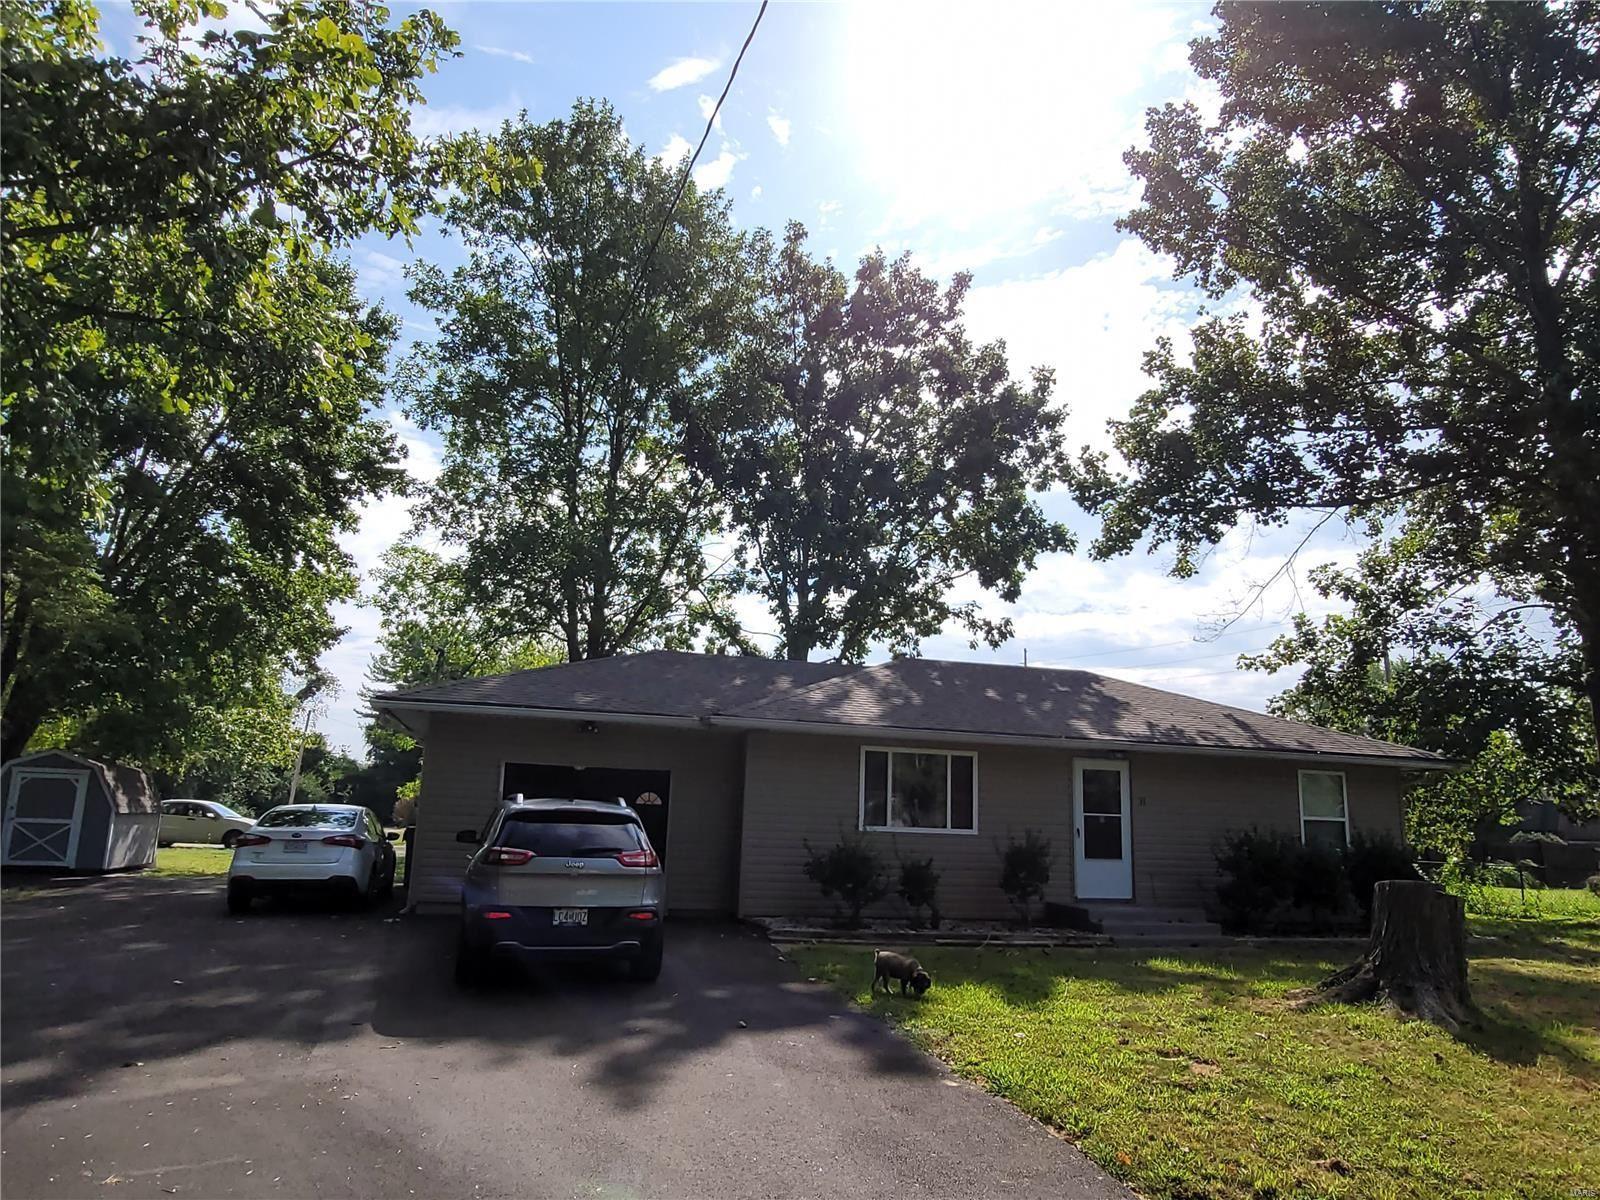 11 Richard Drive, Belleville, IL 62223 - MLS#: 21069290